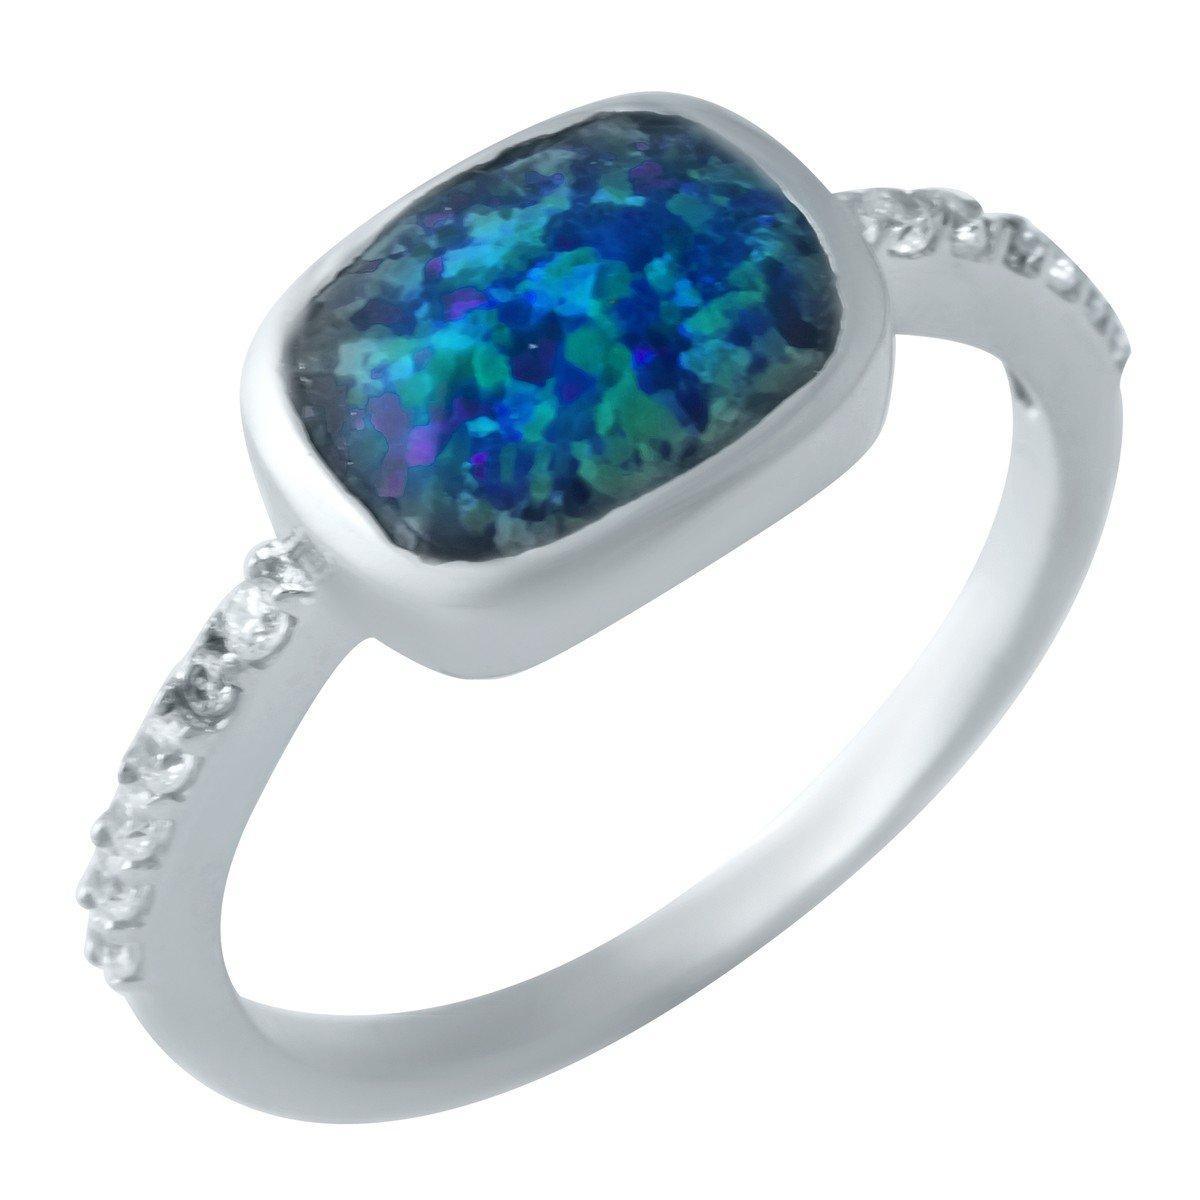 Серебряное кольцо DreamJewelry с опалом (1922842) 18.5 размер